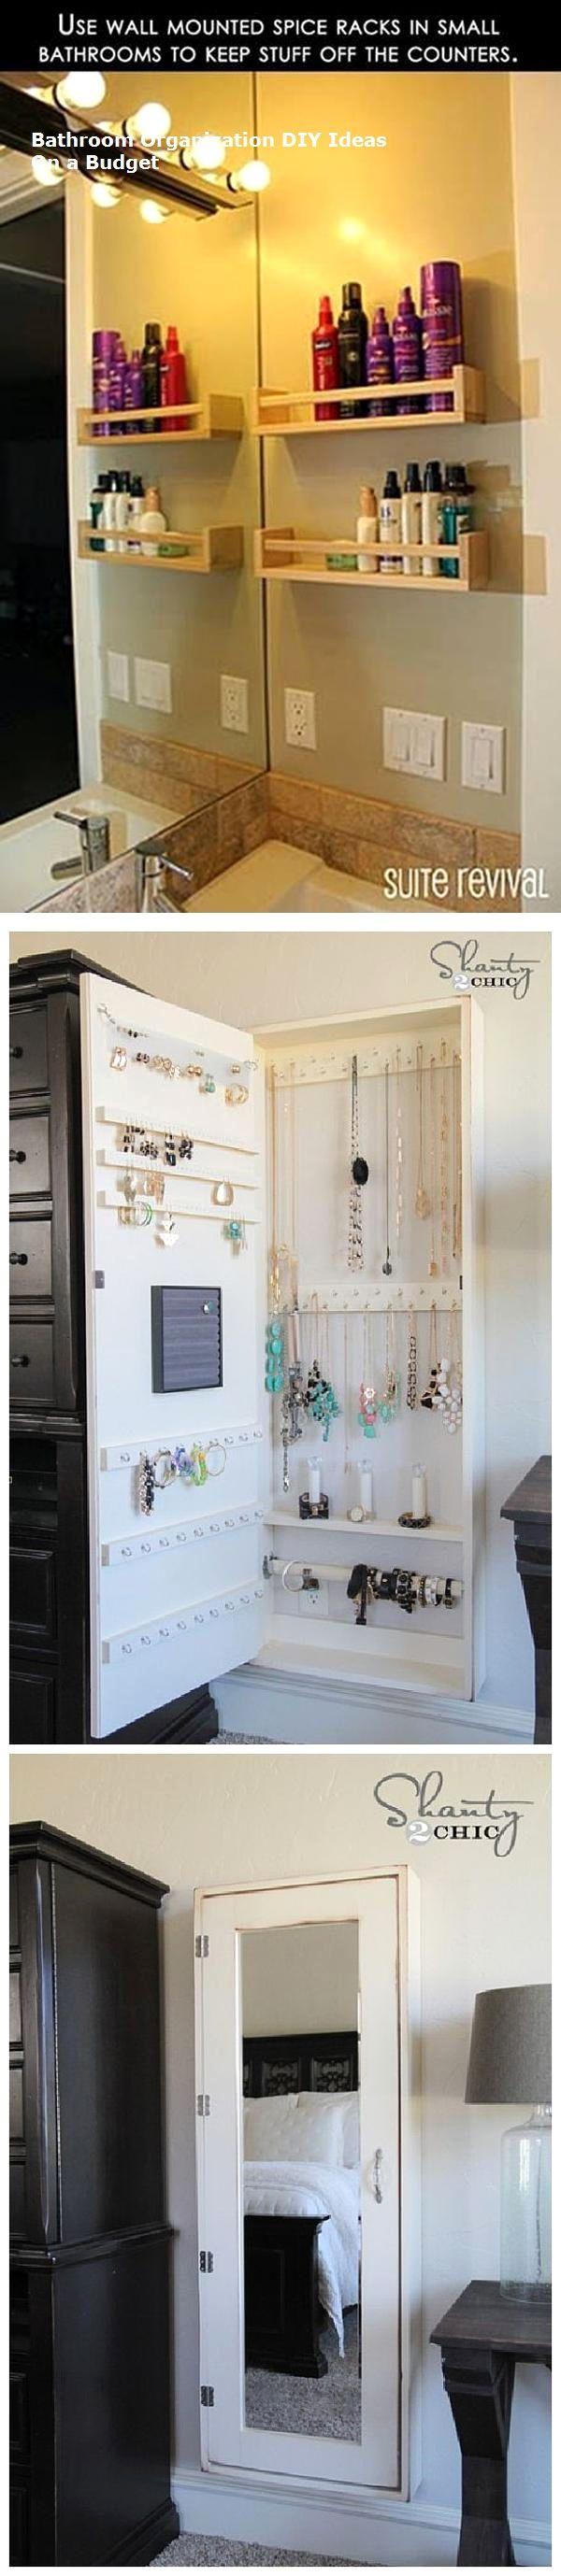 15 creative storage diy ideas for modern bathrooms 1